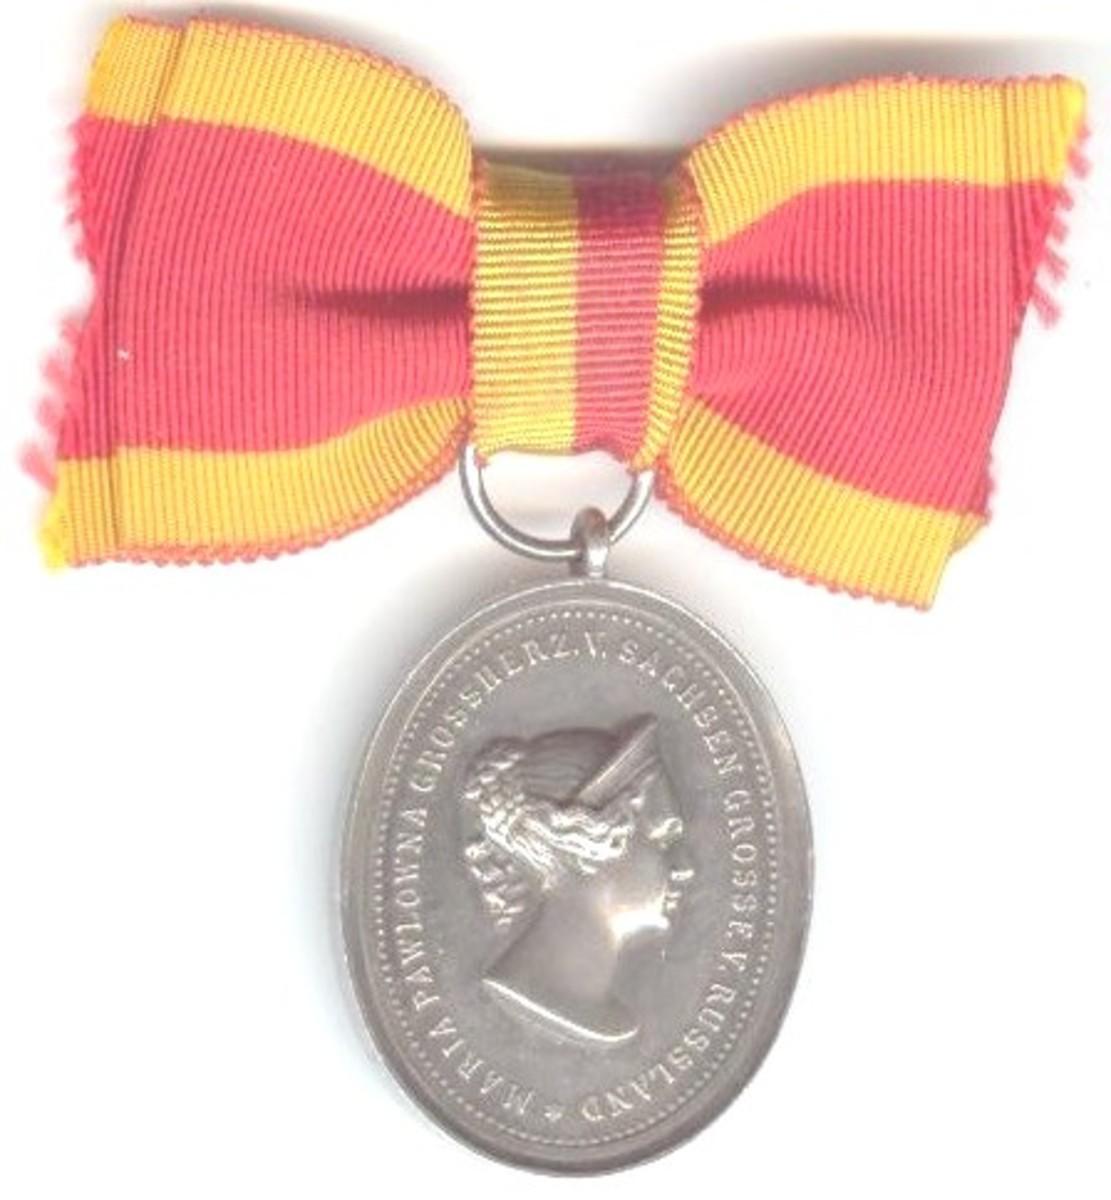 Saxe Weimar medal